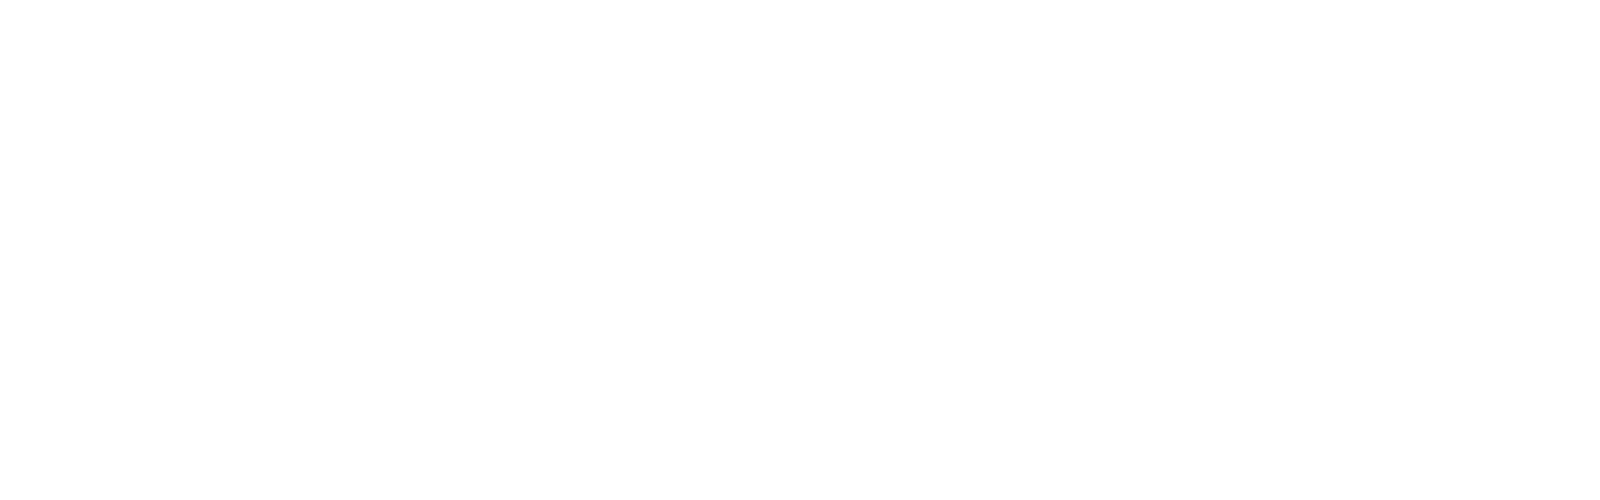 La Revue – Terrebonne et Mascouche